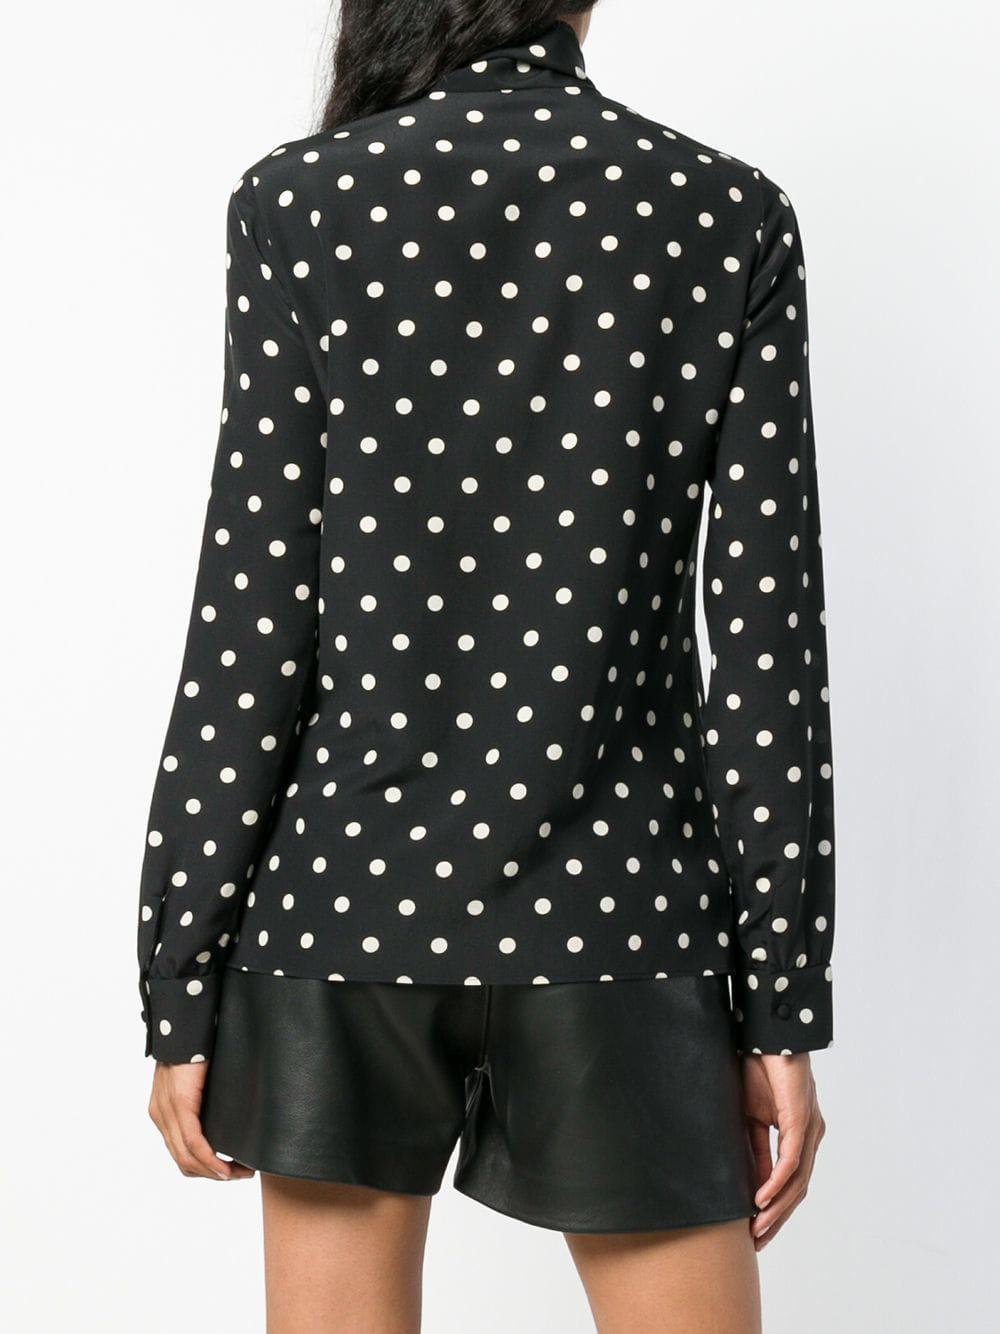 fa63bd61 Saint Laurent - Black Polka Dot Pussy Bow Blouse - Lyst. View fullscreen